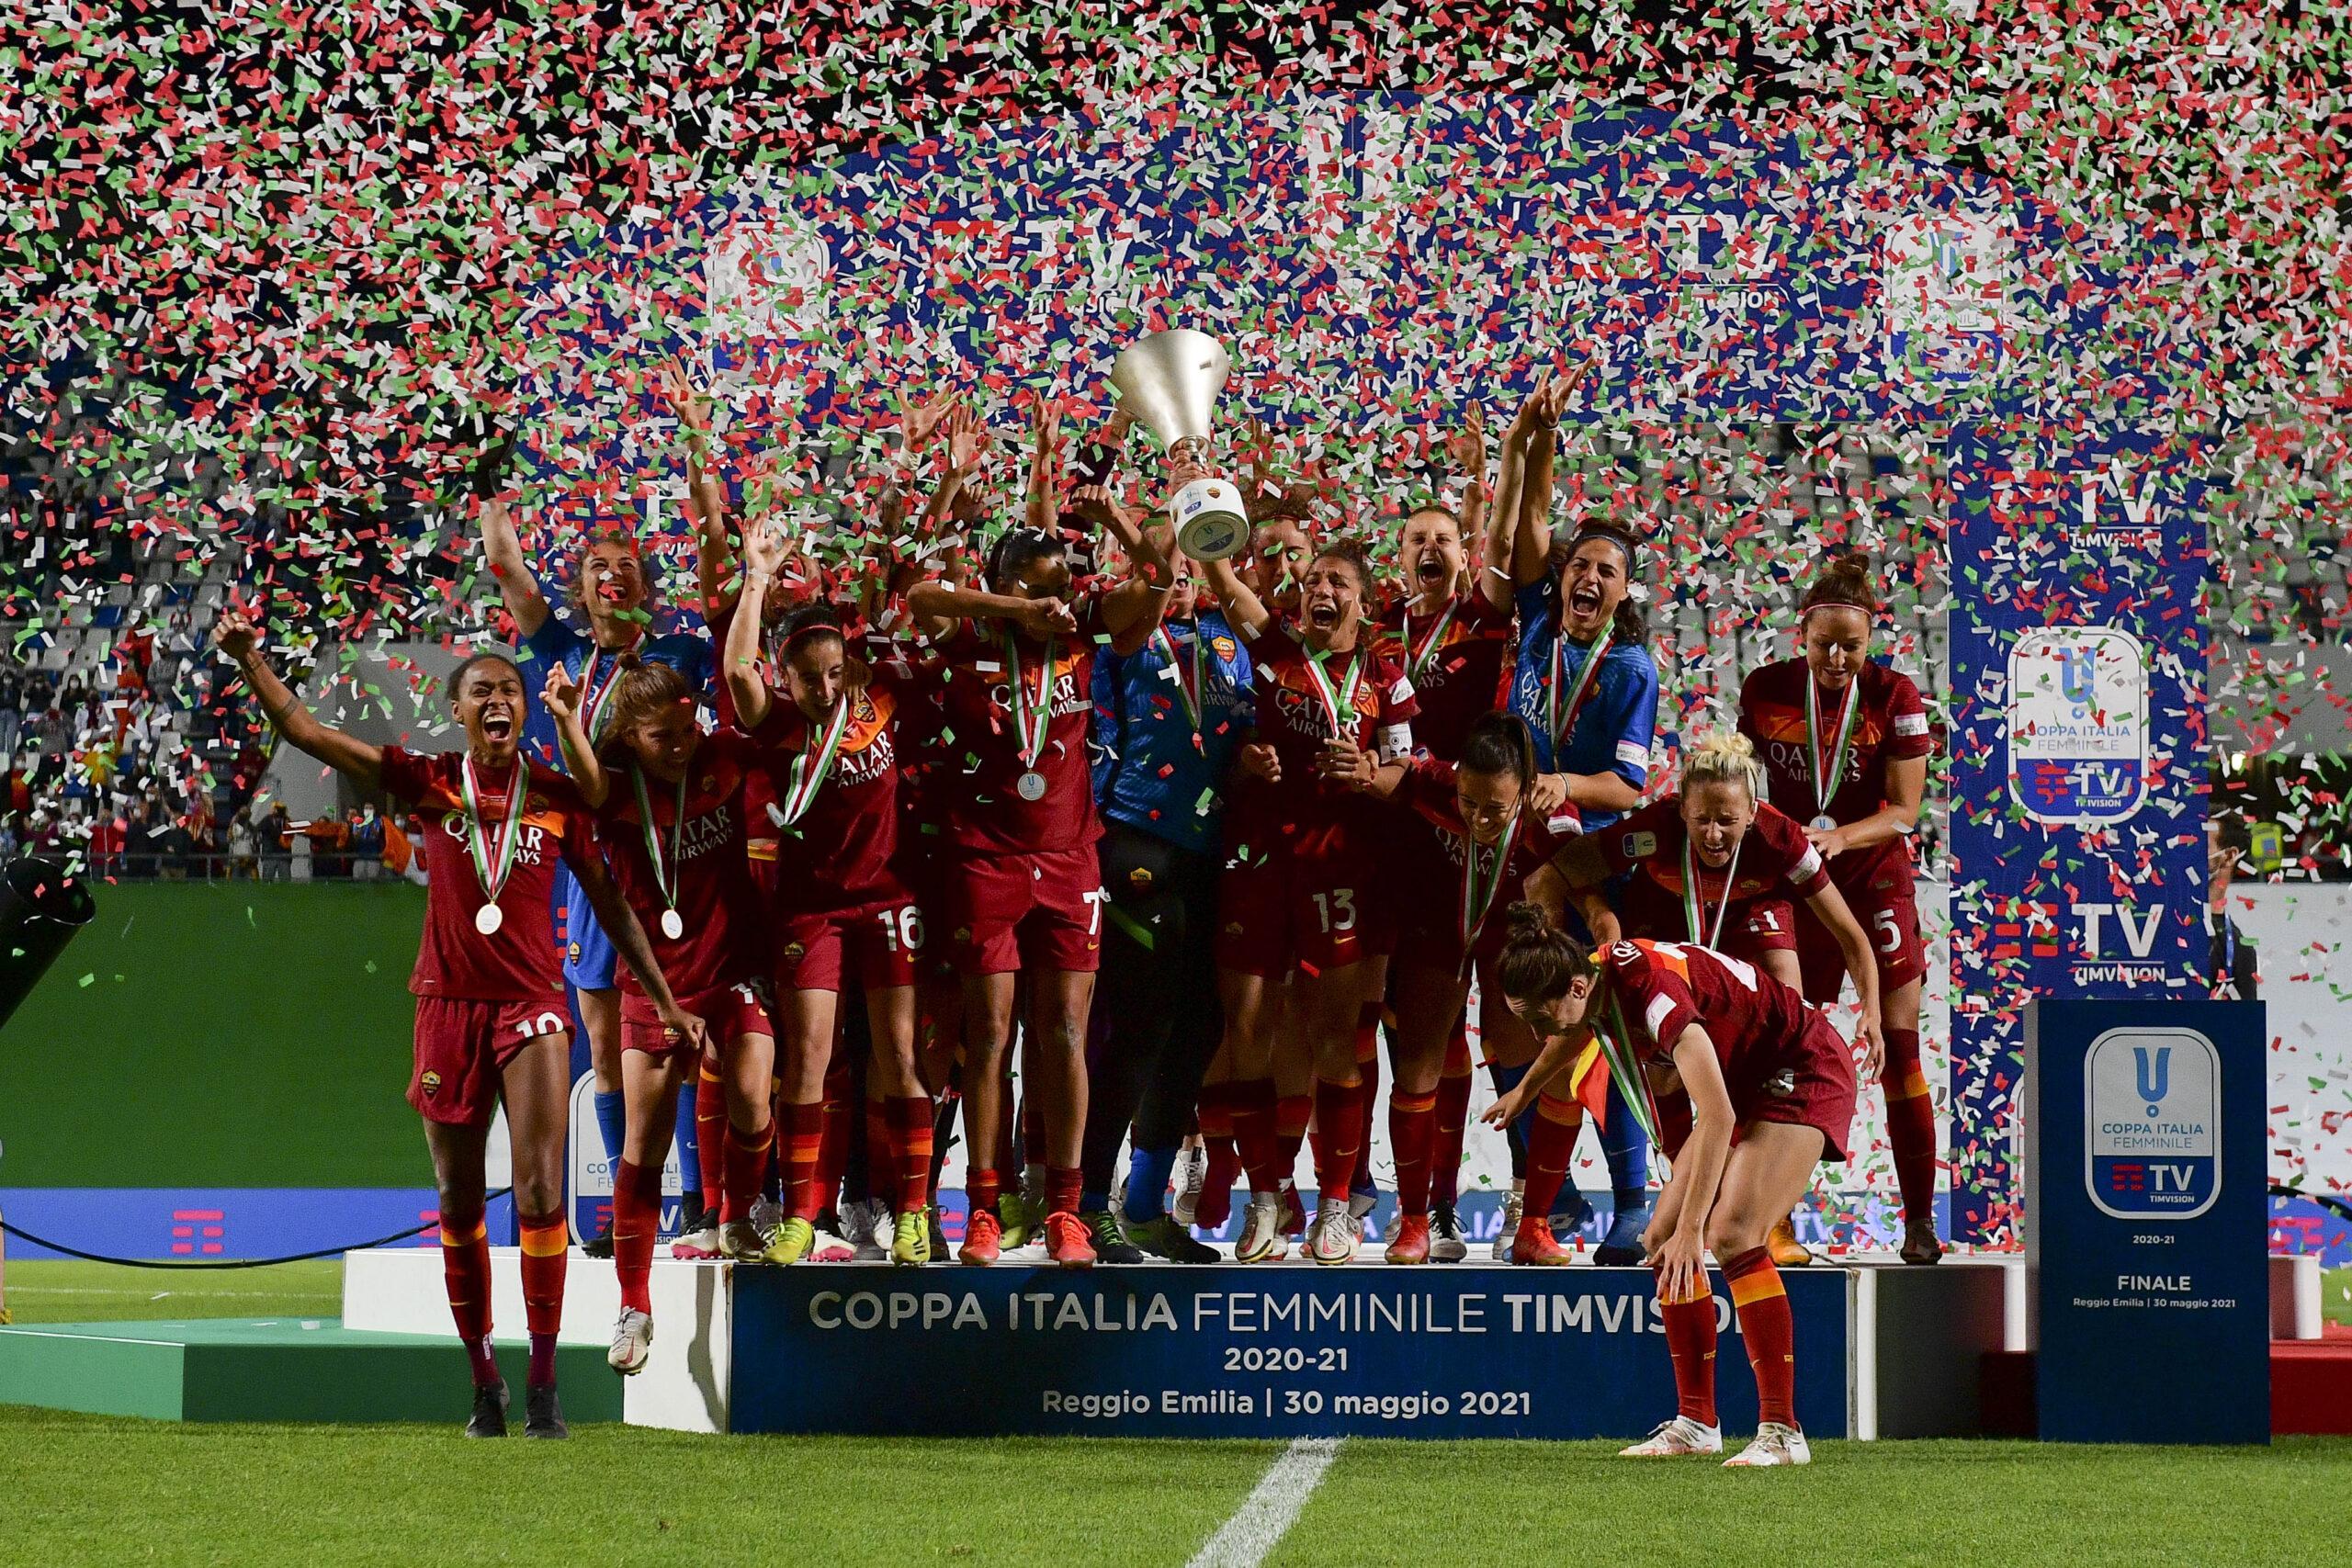 Roma Coppa Italia